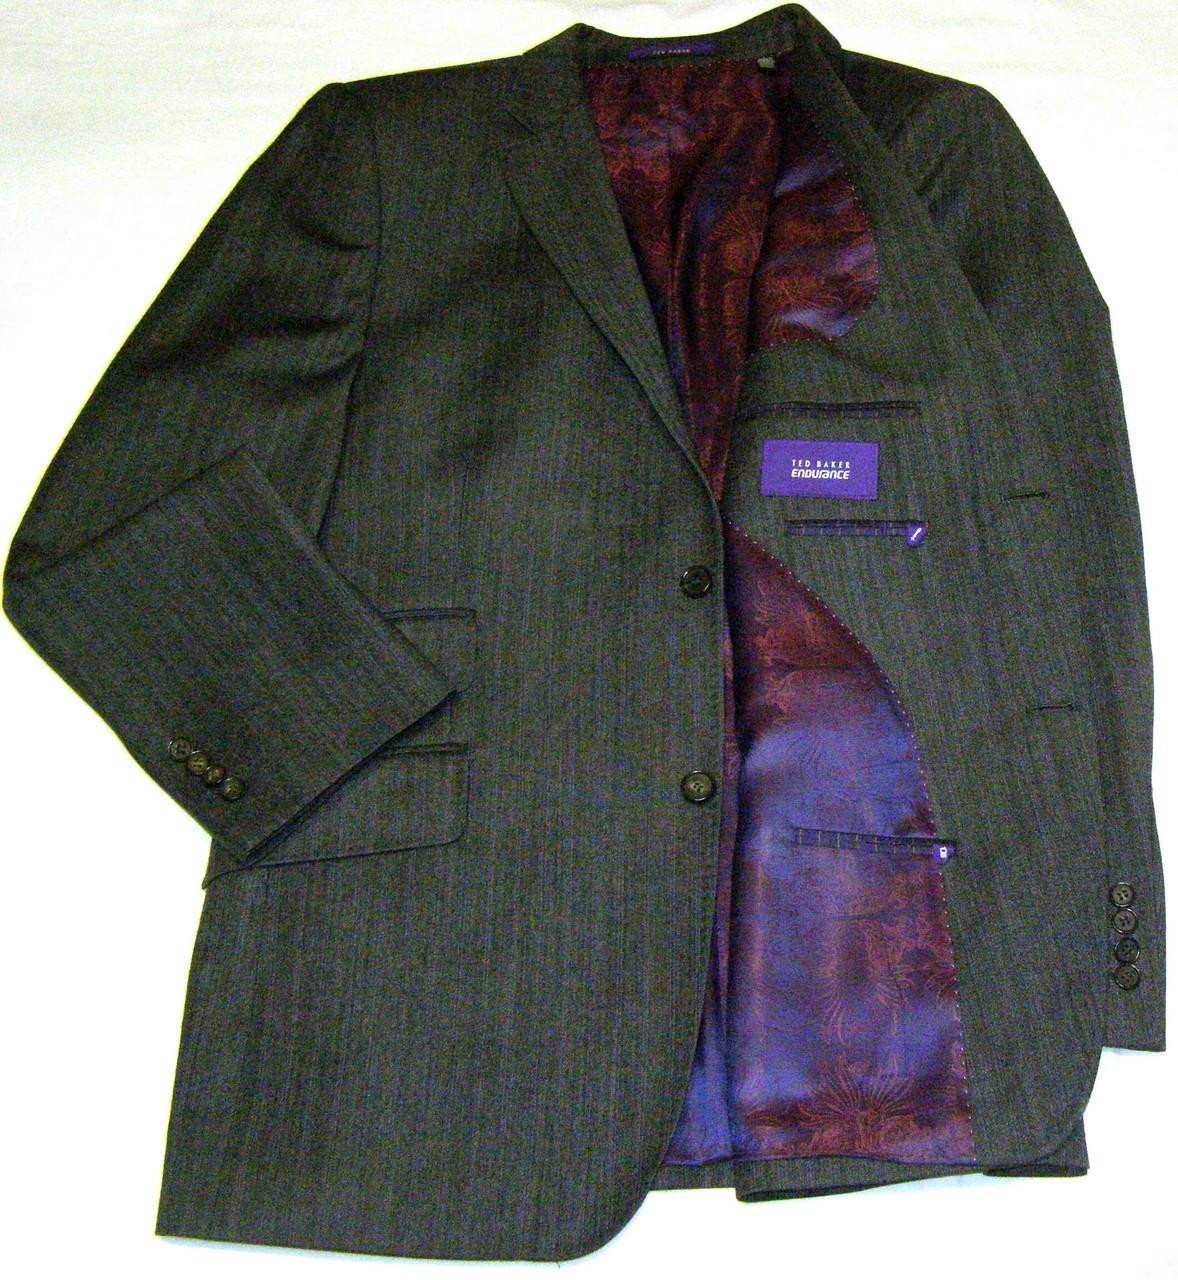 Пиджак Ted Baker (50-52), фото 1